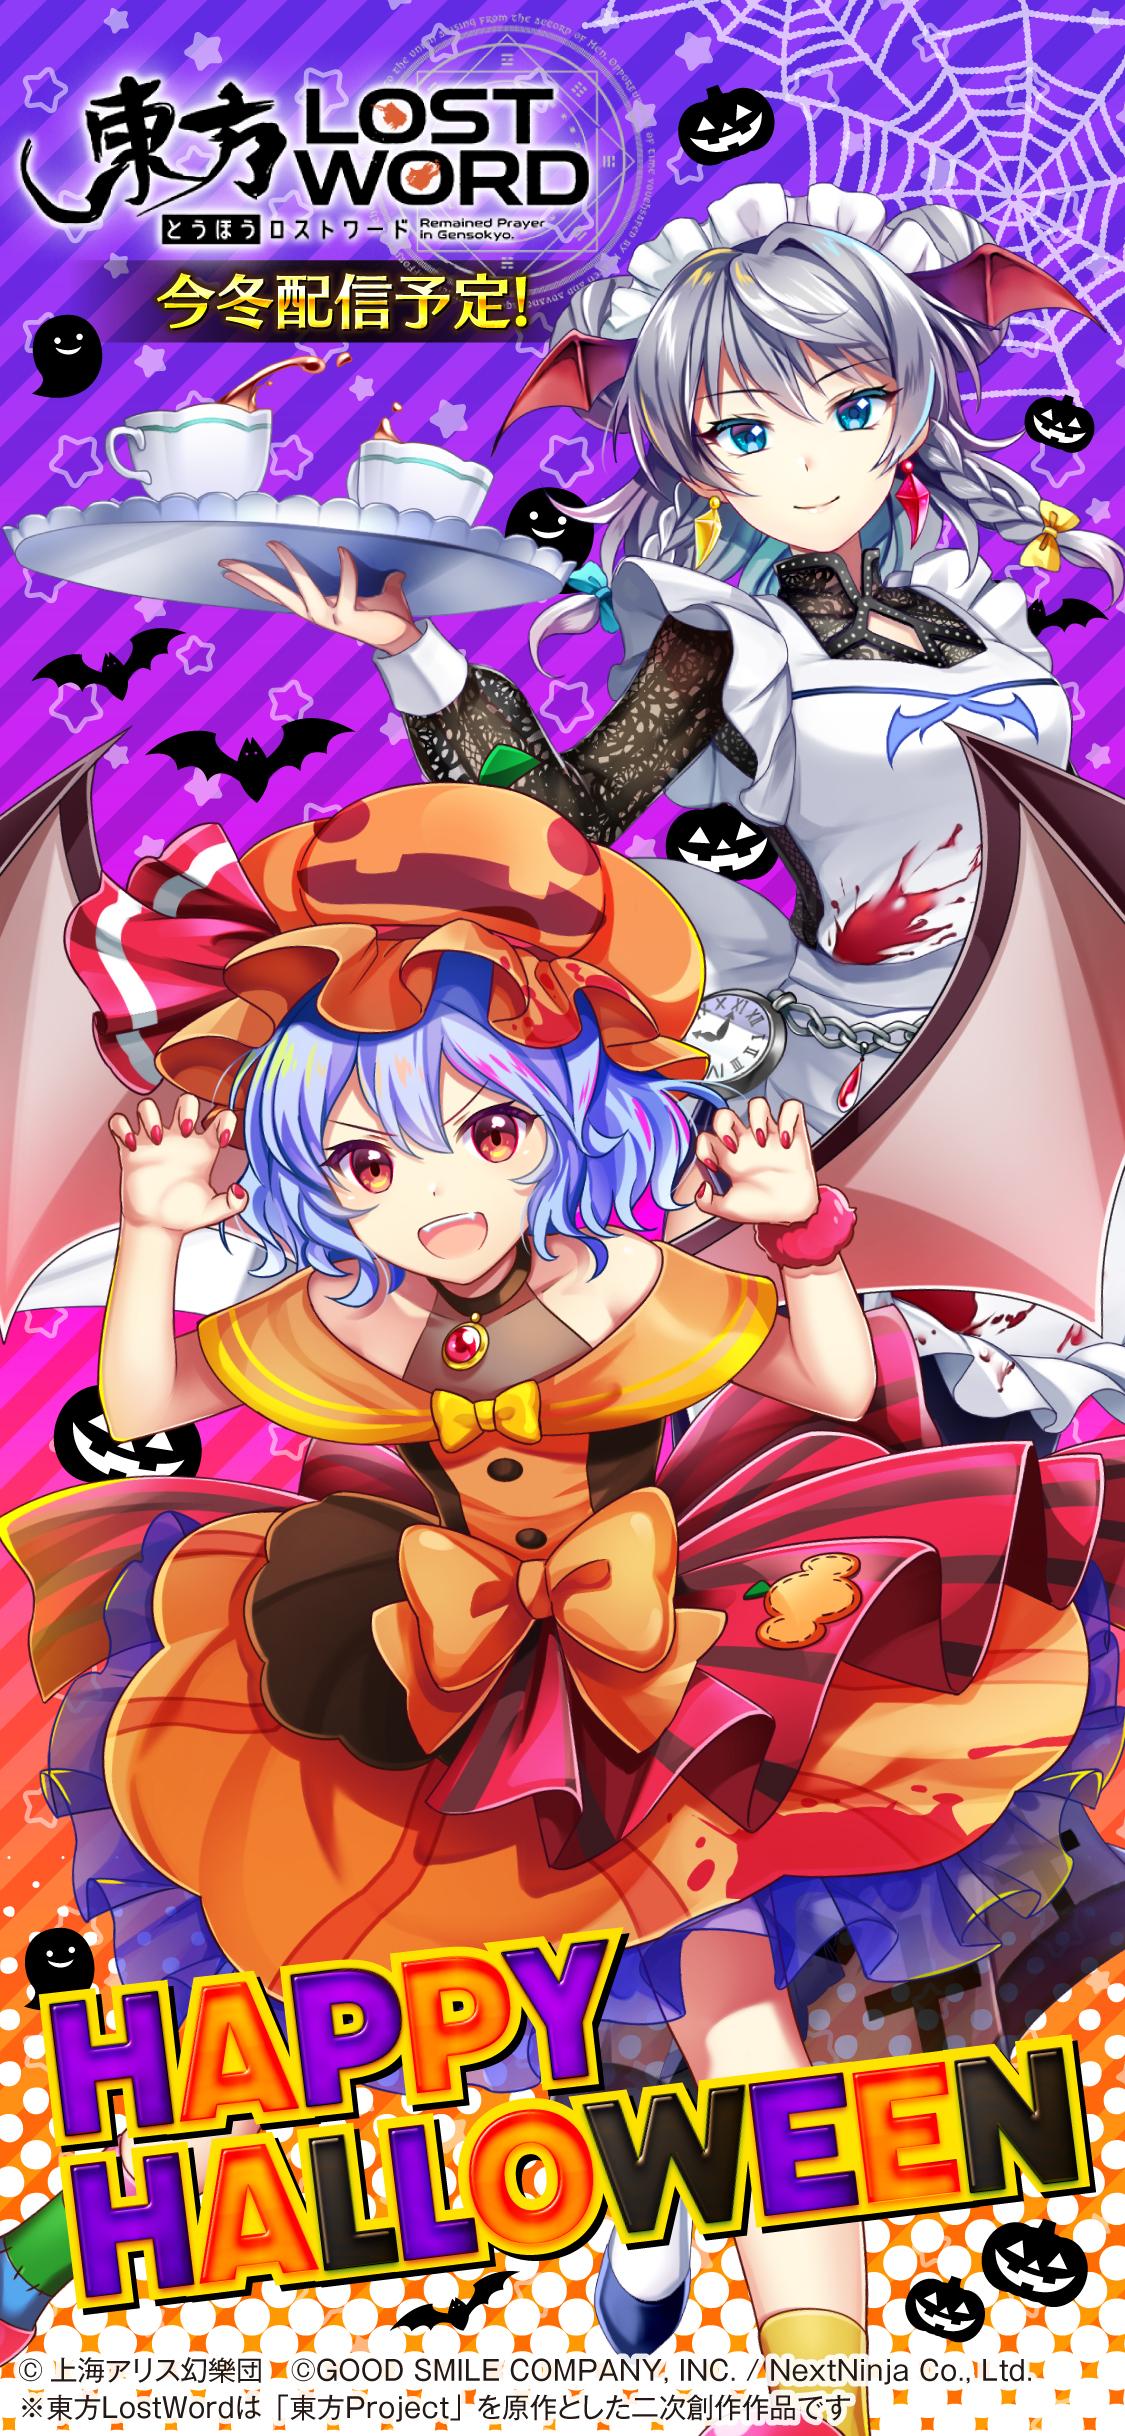 Happy Halloween 壁紙プレゼント 東方lostword 東方ロストワード